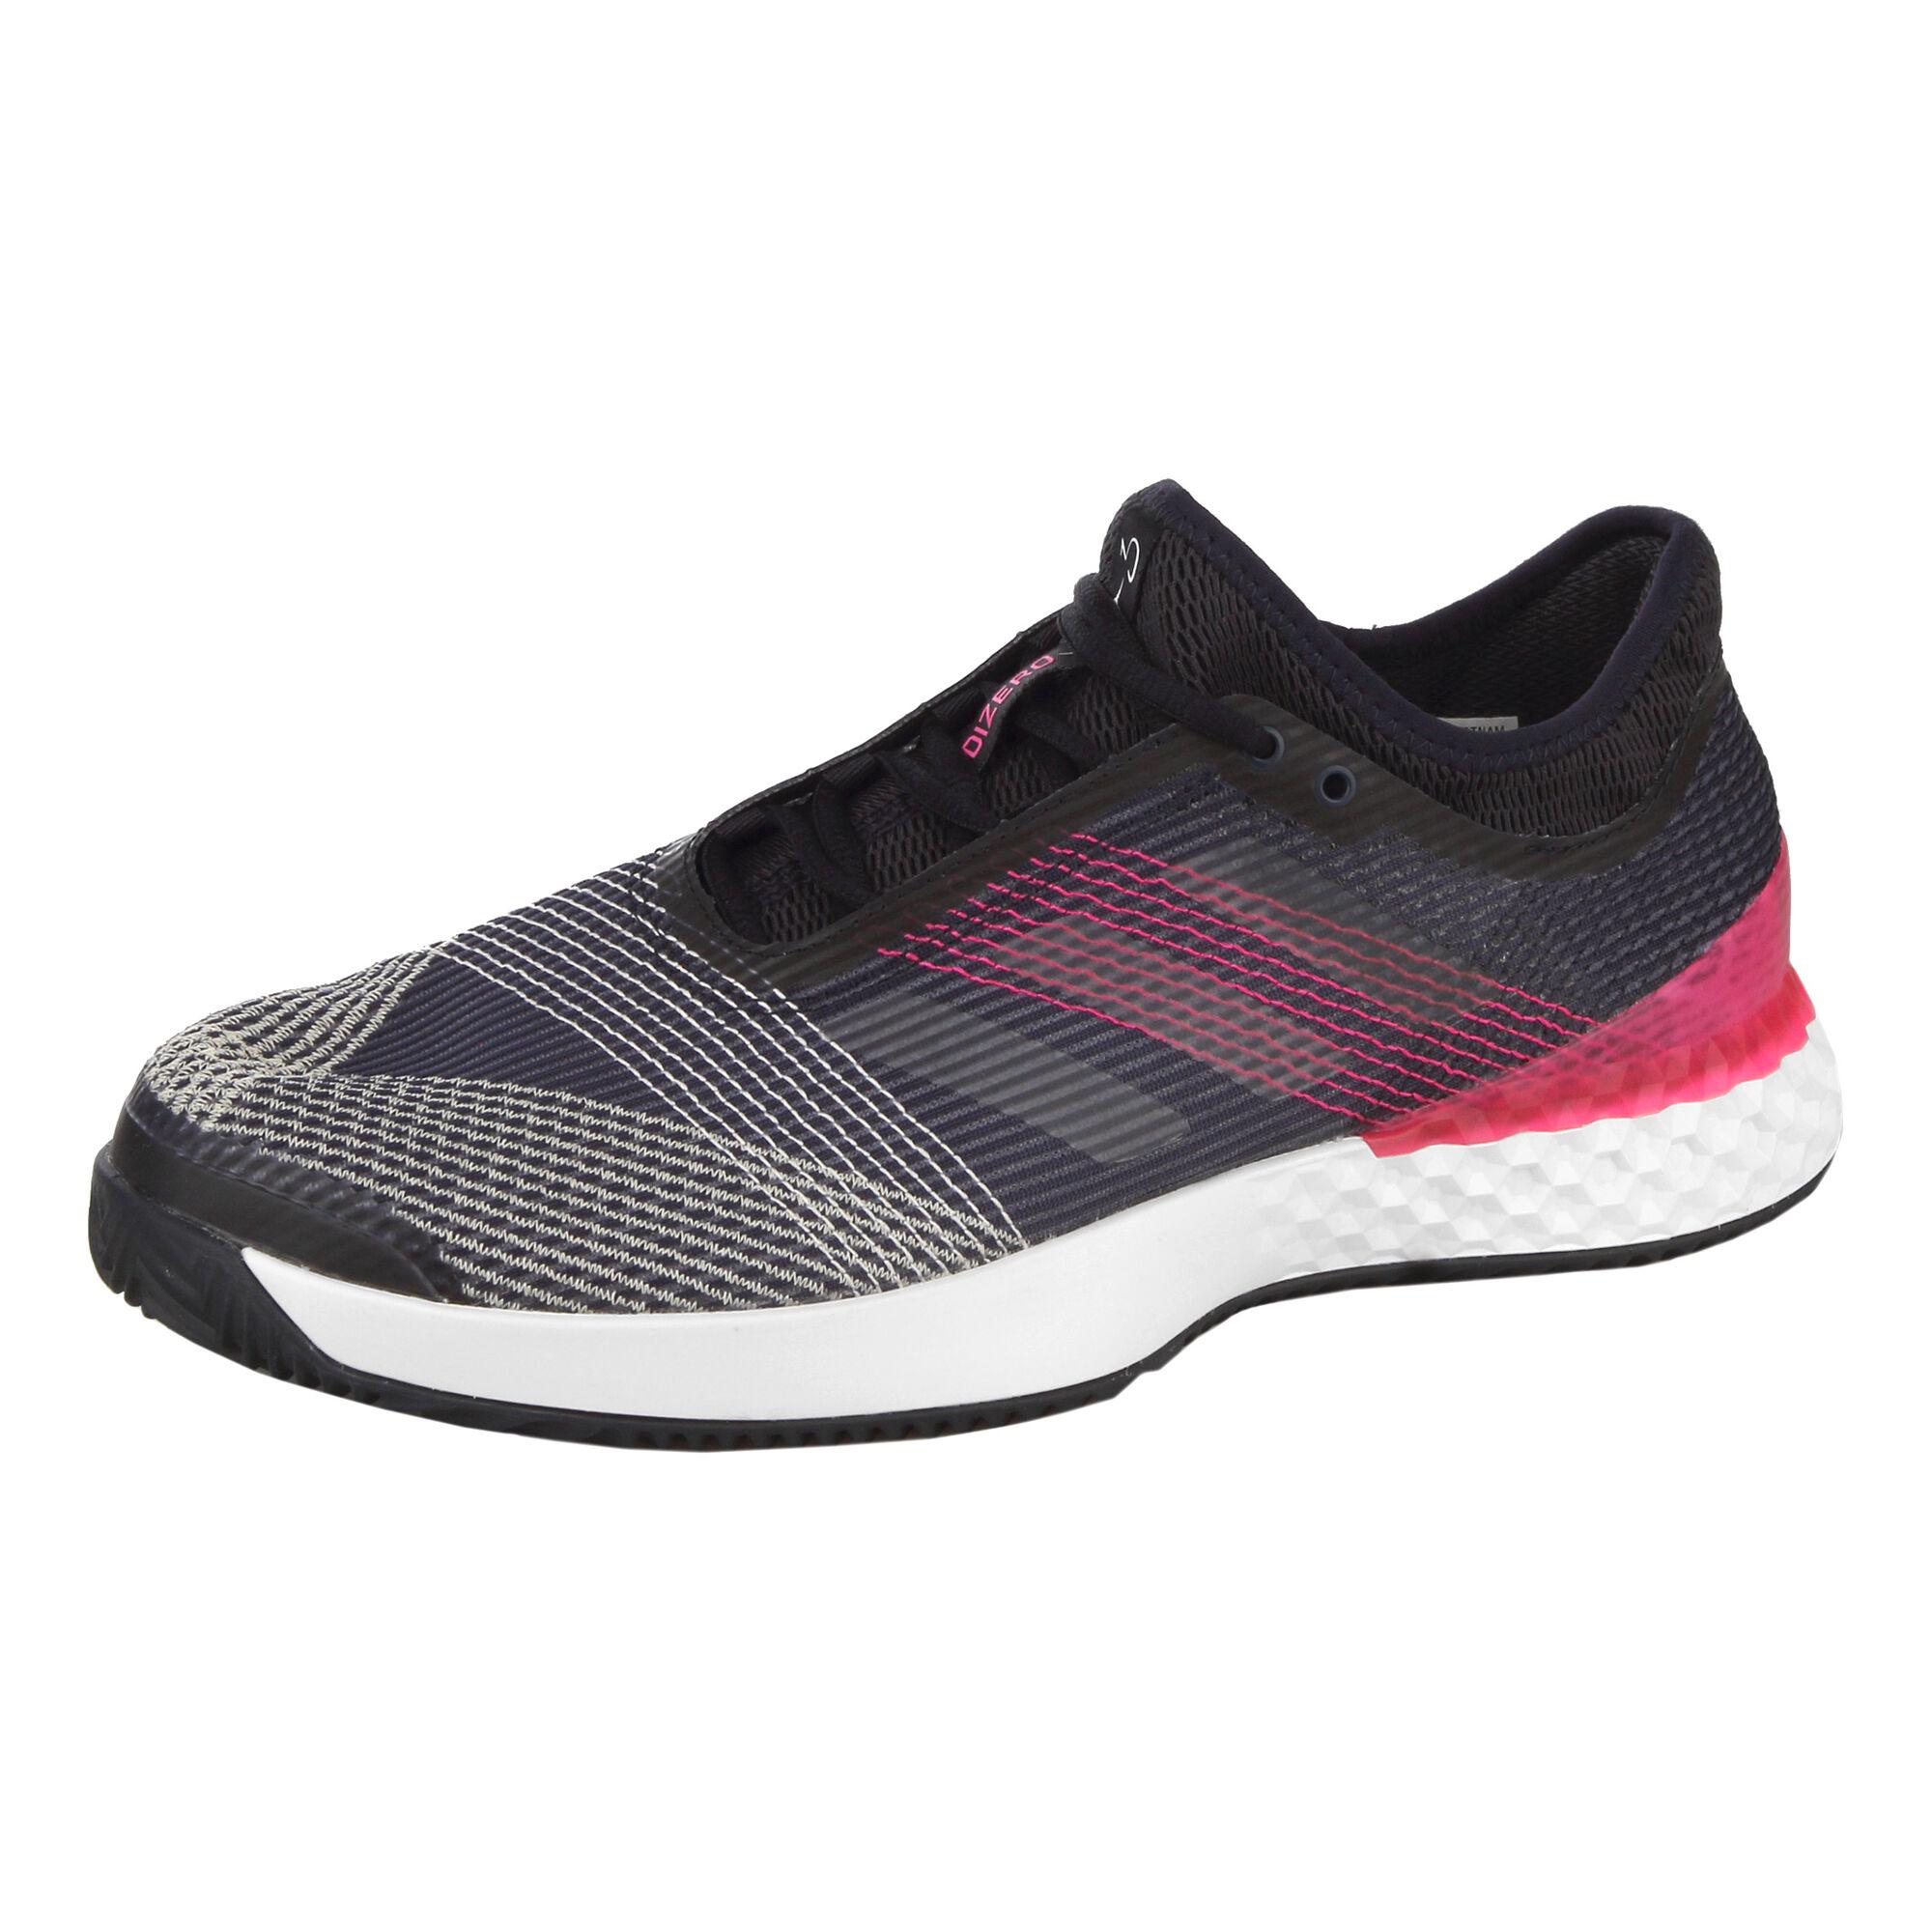 new style 8810a 109ec adidas adidas adidas adidas adidas adidas adidas adidas. Adizero  Ubersonic 3 Clay ...